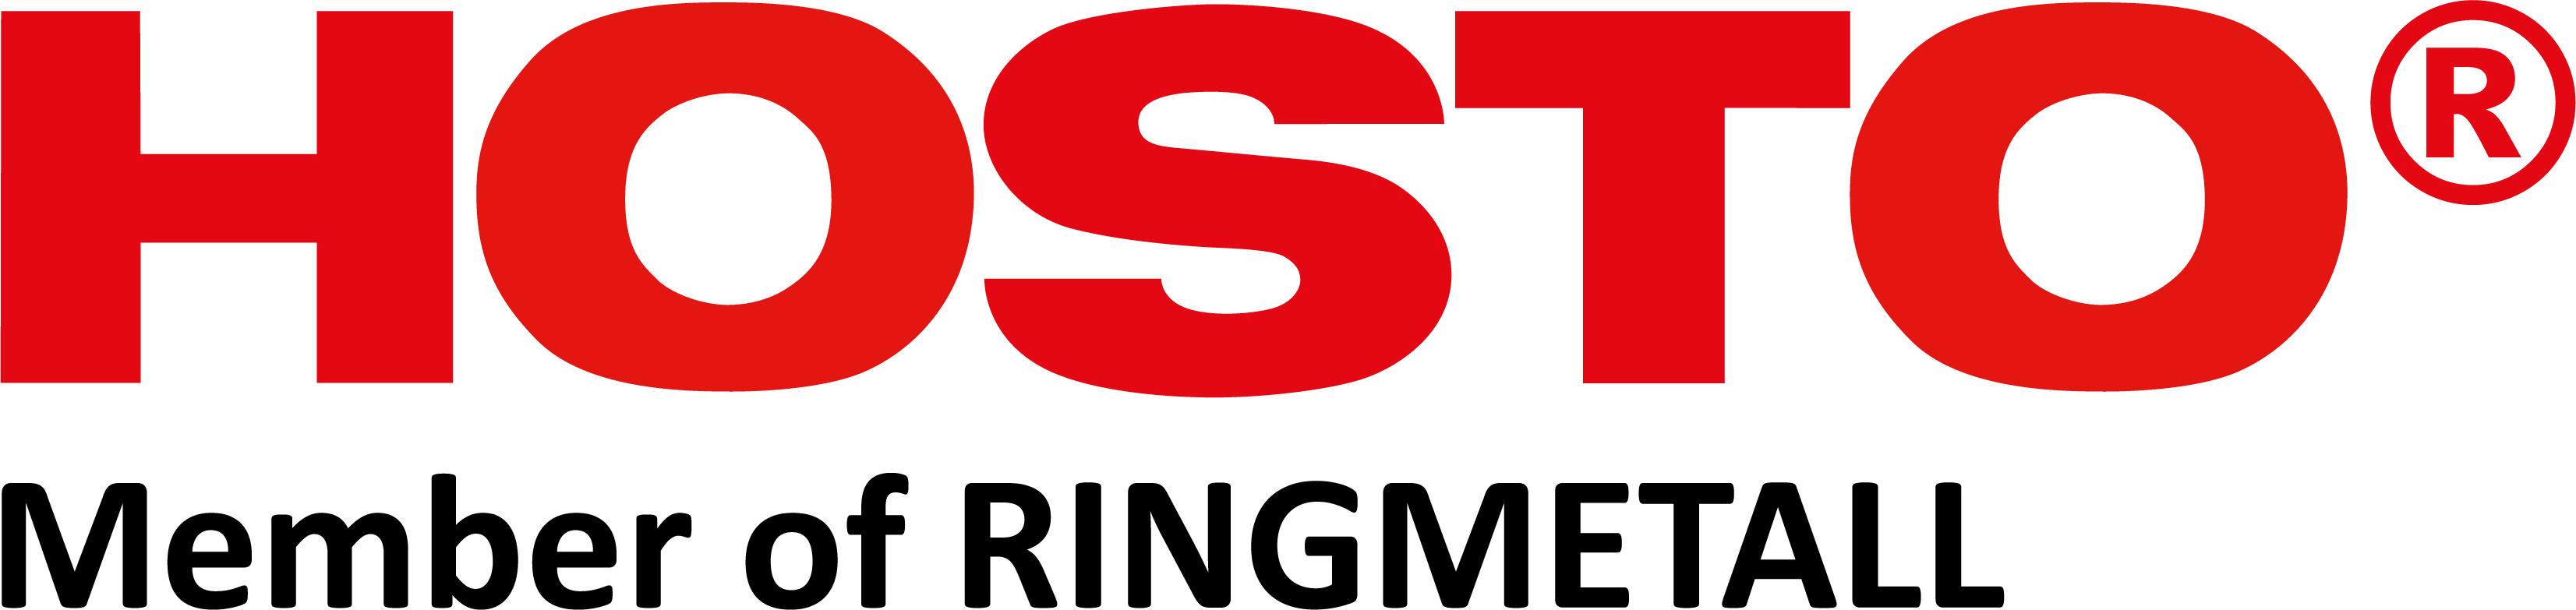 HOSTO Stolz GmbH & Co.  KG  Draht und Metallwaren